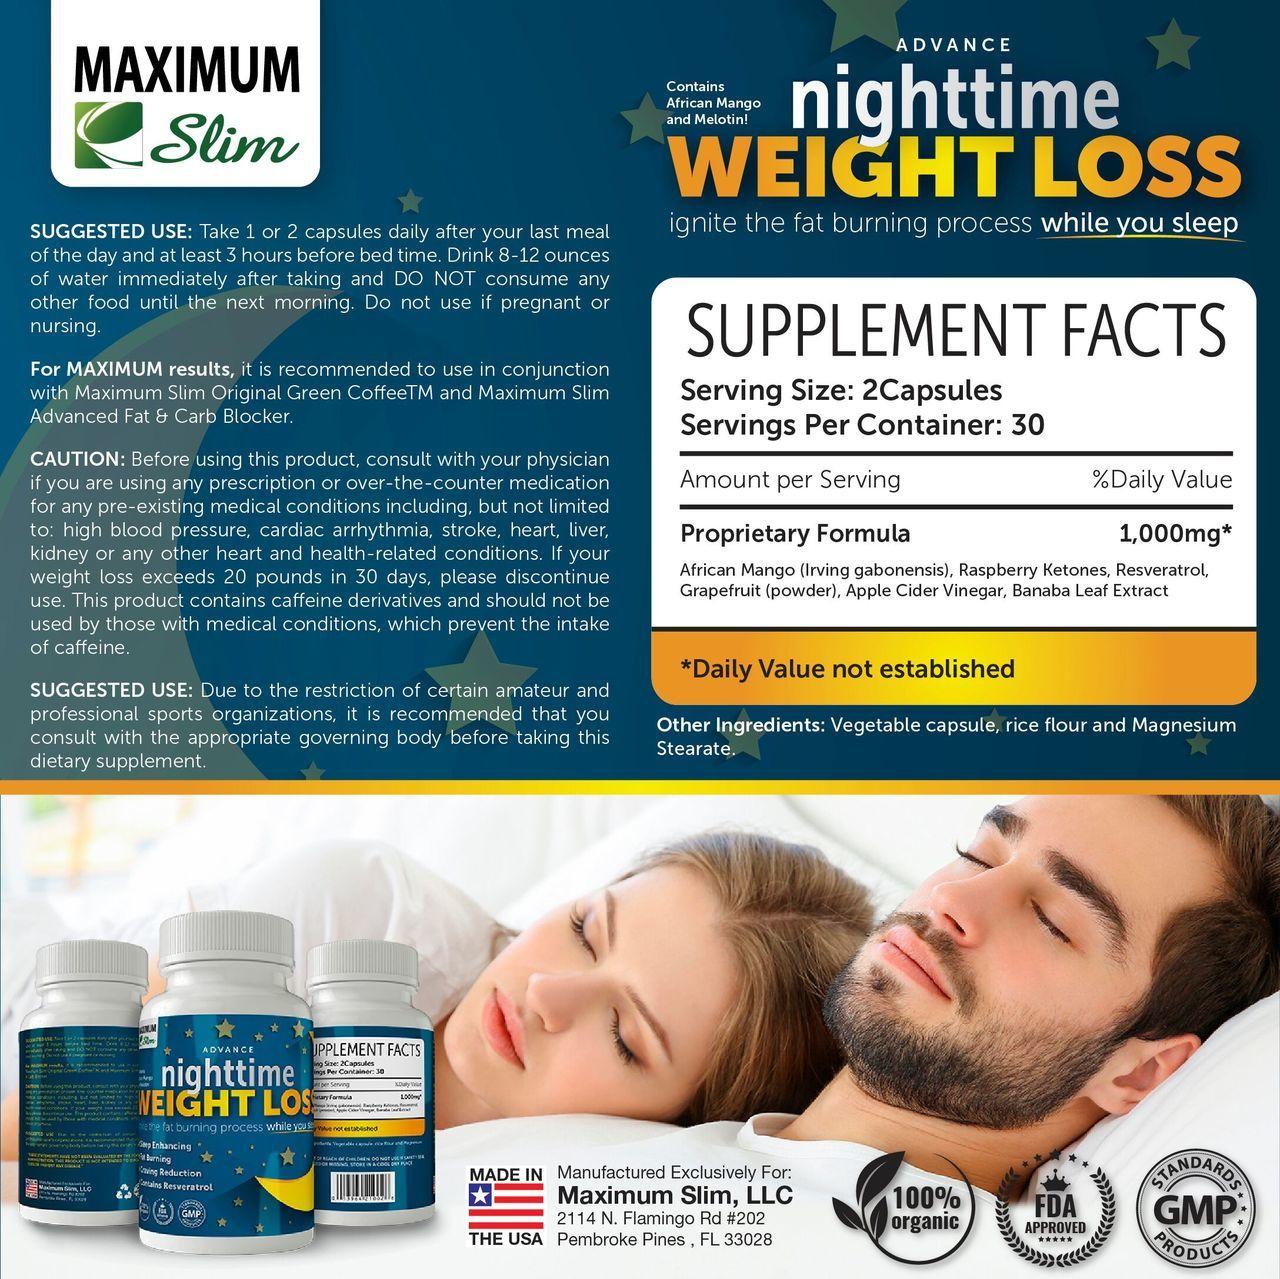 nighttime-weight-loss-label-presentations.jpg